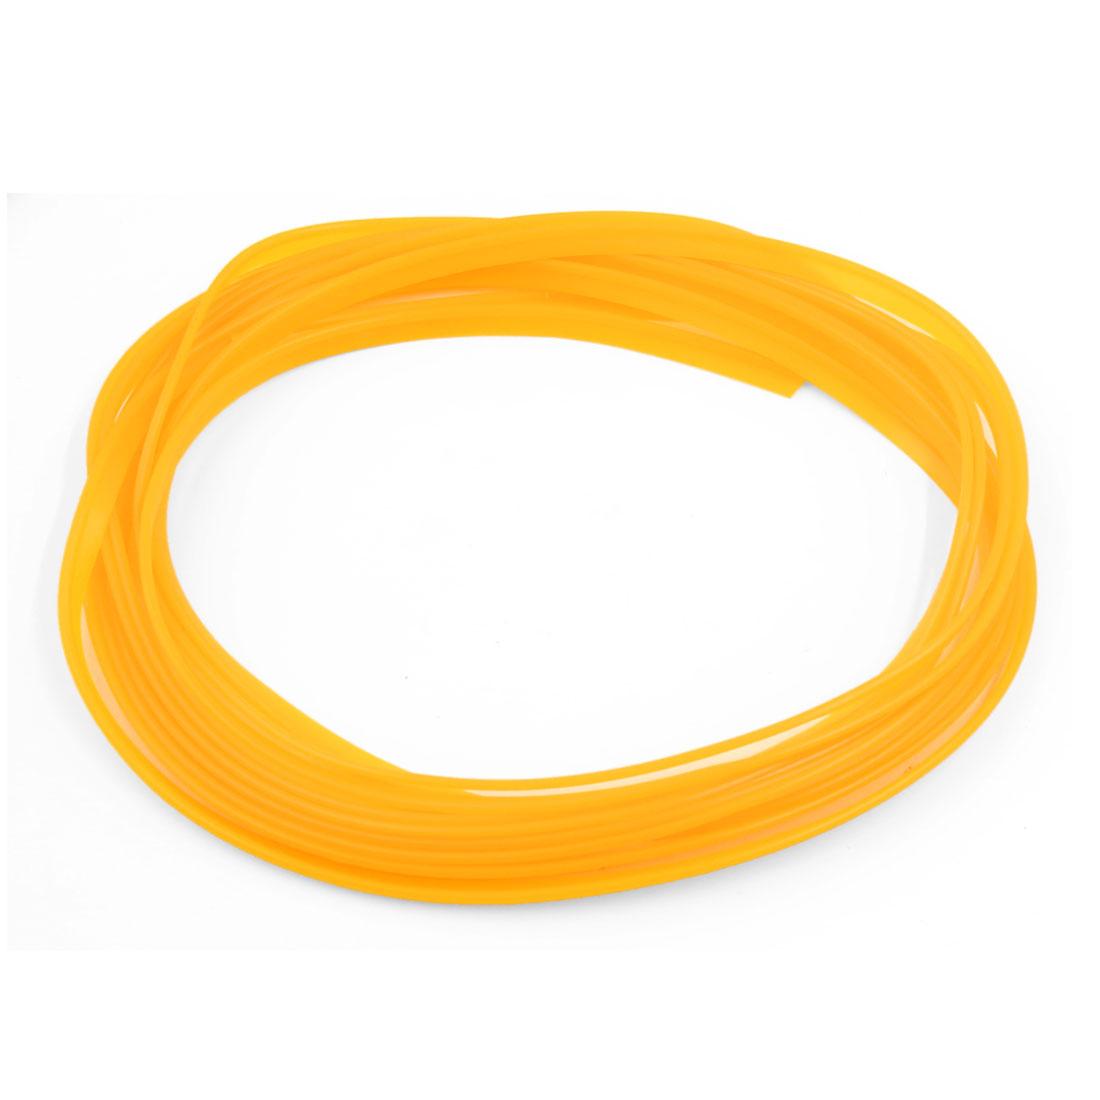 5M Yellow Flexible Trim for Car Interior Exterrior Moulding Strip Decorative Line